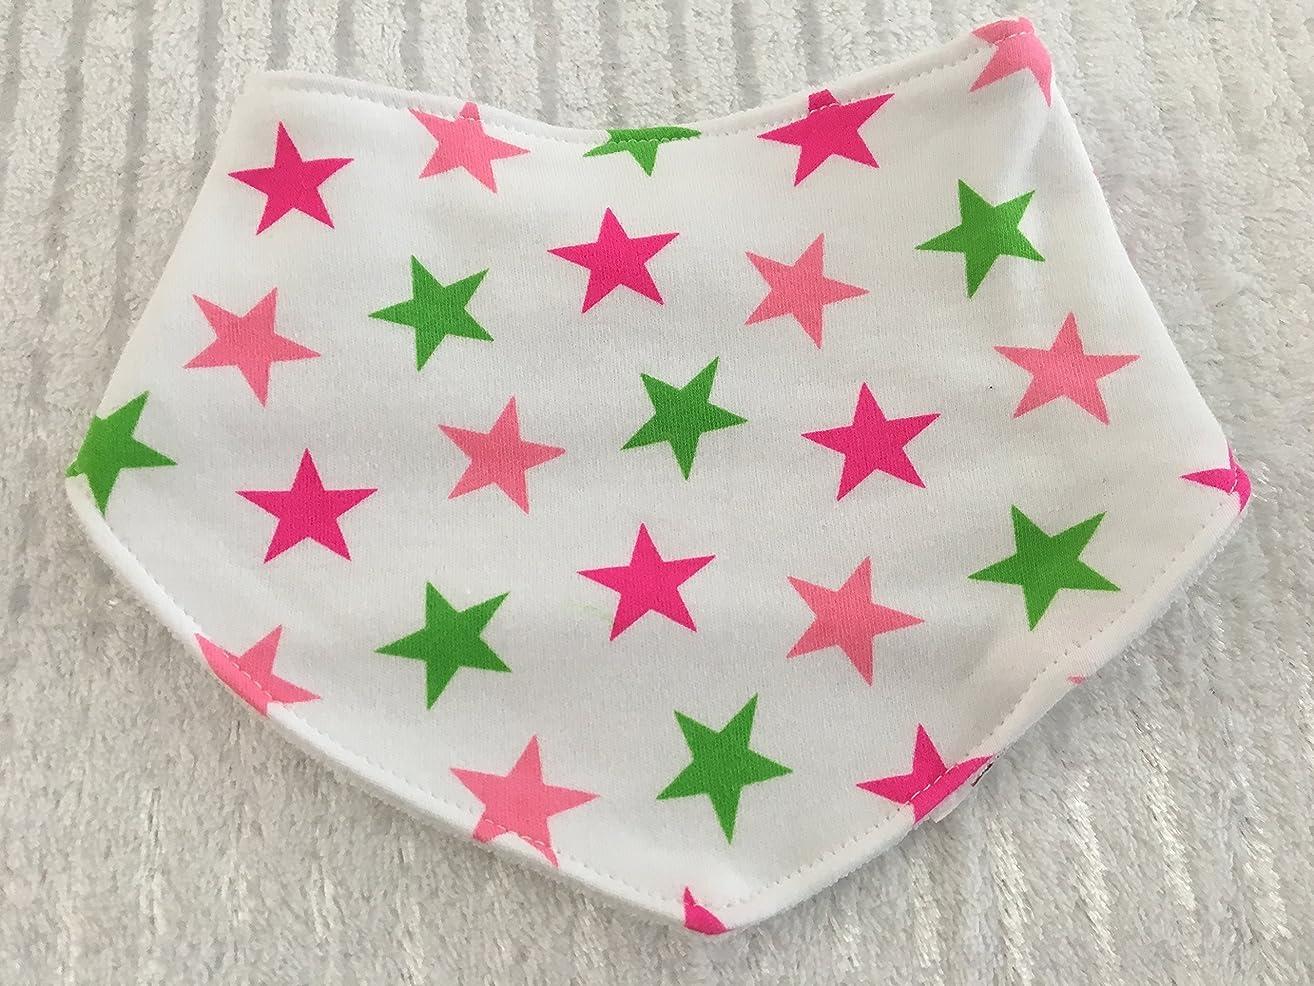 Pink Green and White Star Print Bandana Bib, Custom Bandana Bib, Custom Dog Bandana